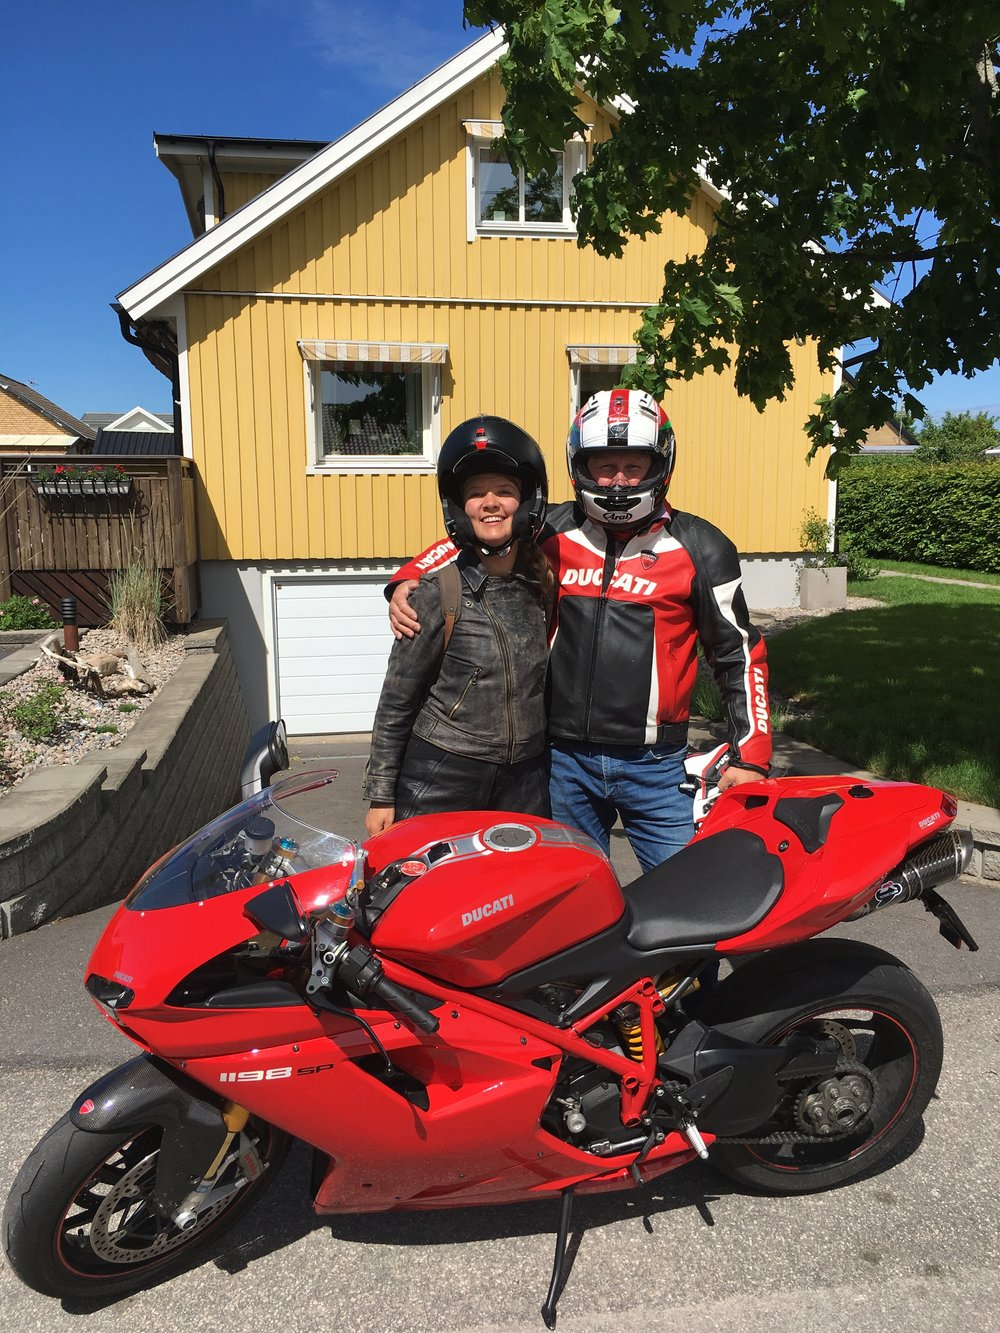 Torbjörn and his Ducati outside his home in Trollhä tten.